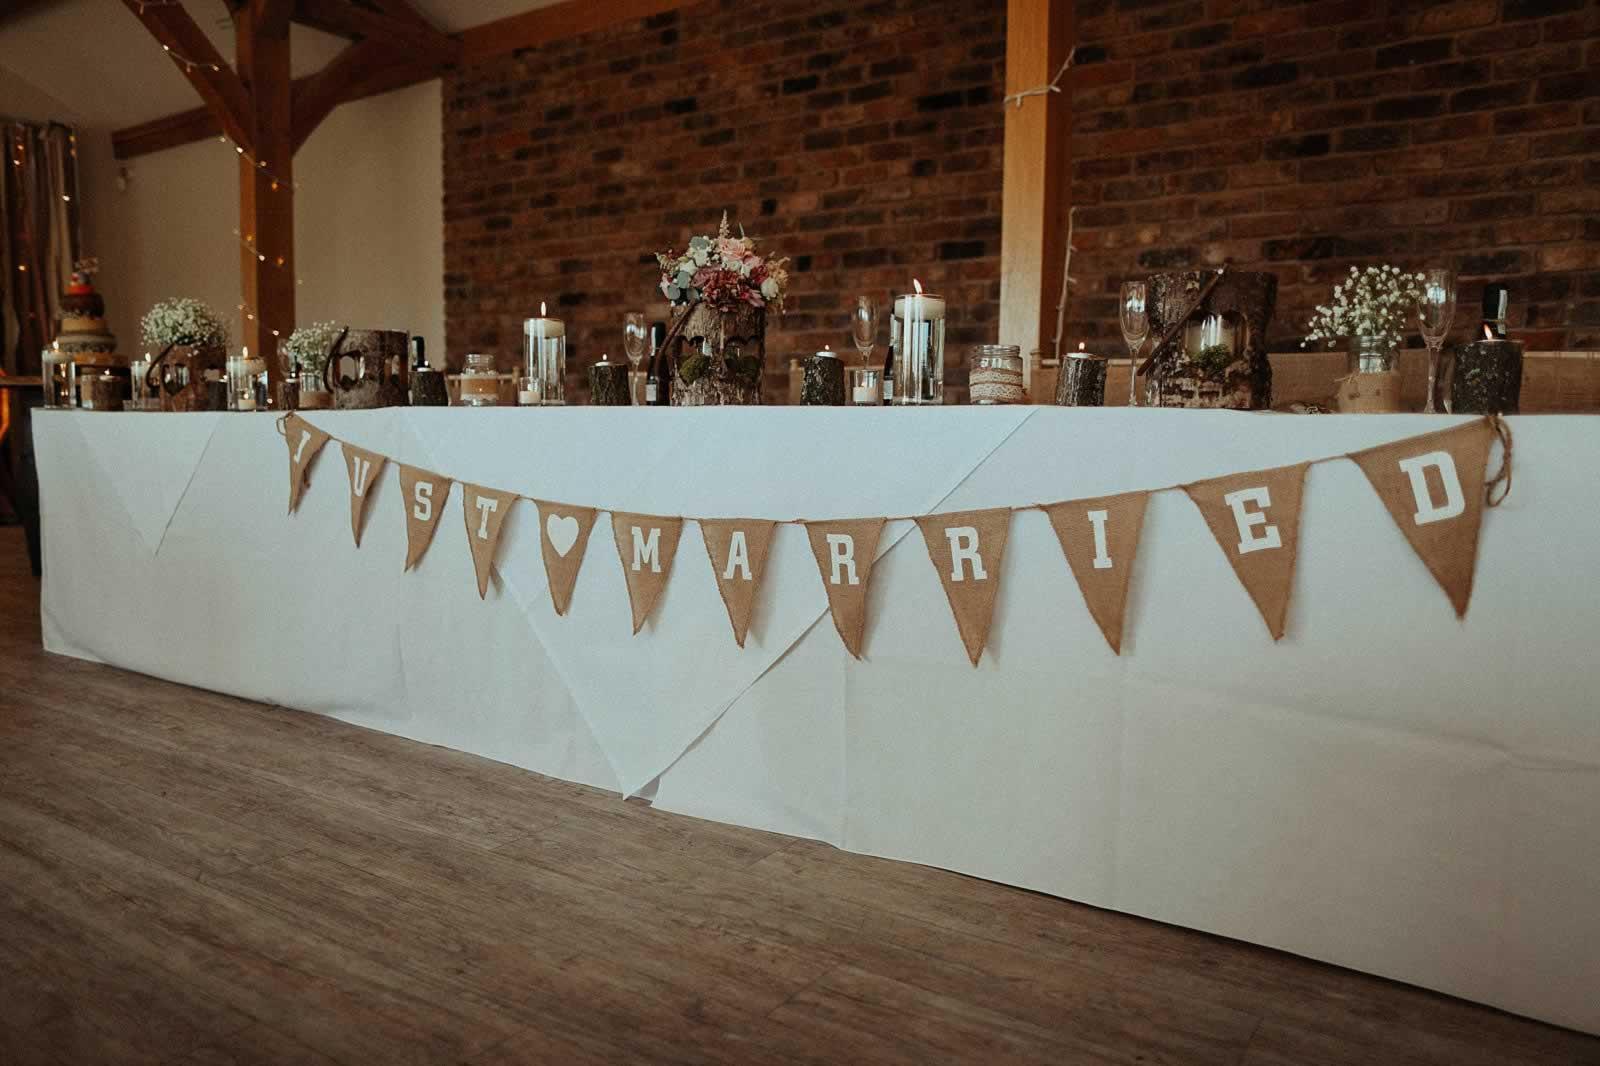 Pryors-Hayes-Wedding-Photography-Barn-Venue-Cheshire-embee-photography-0145.jpg